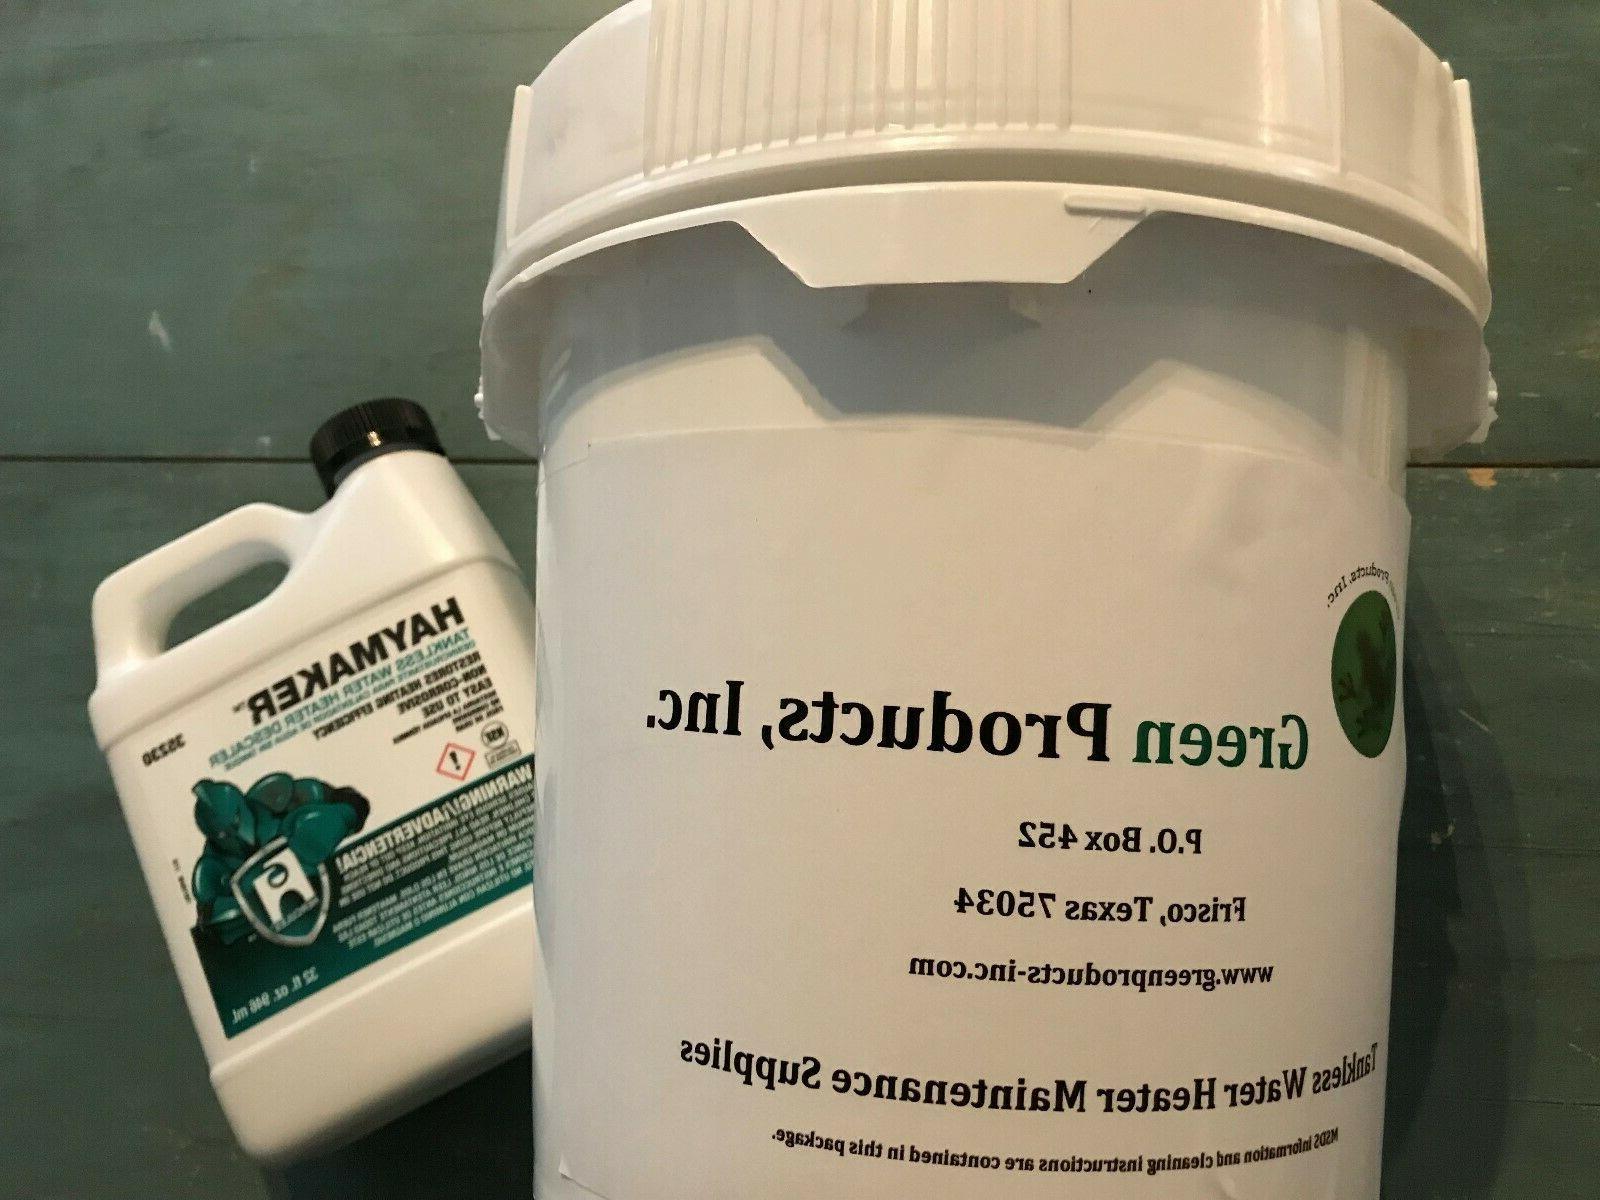 tankless water heater cleaning flushing descaler kit